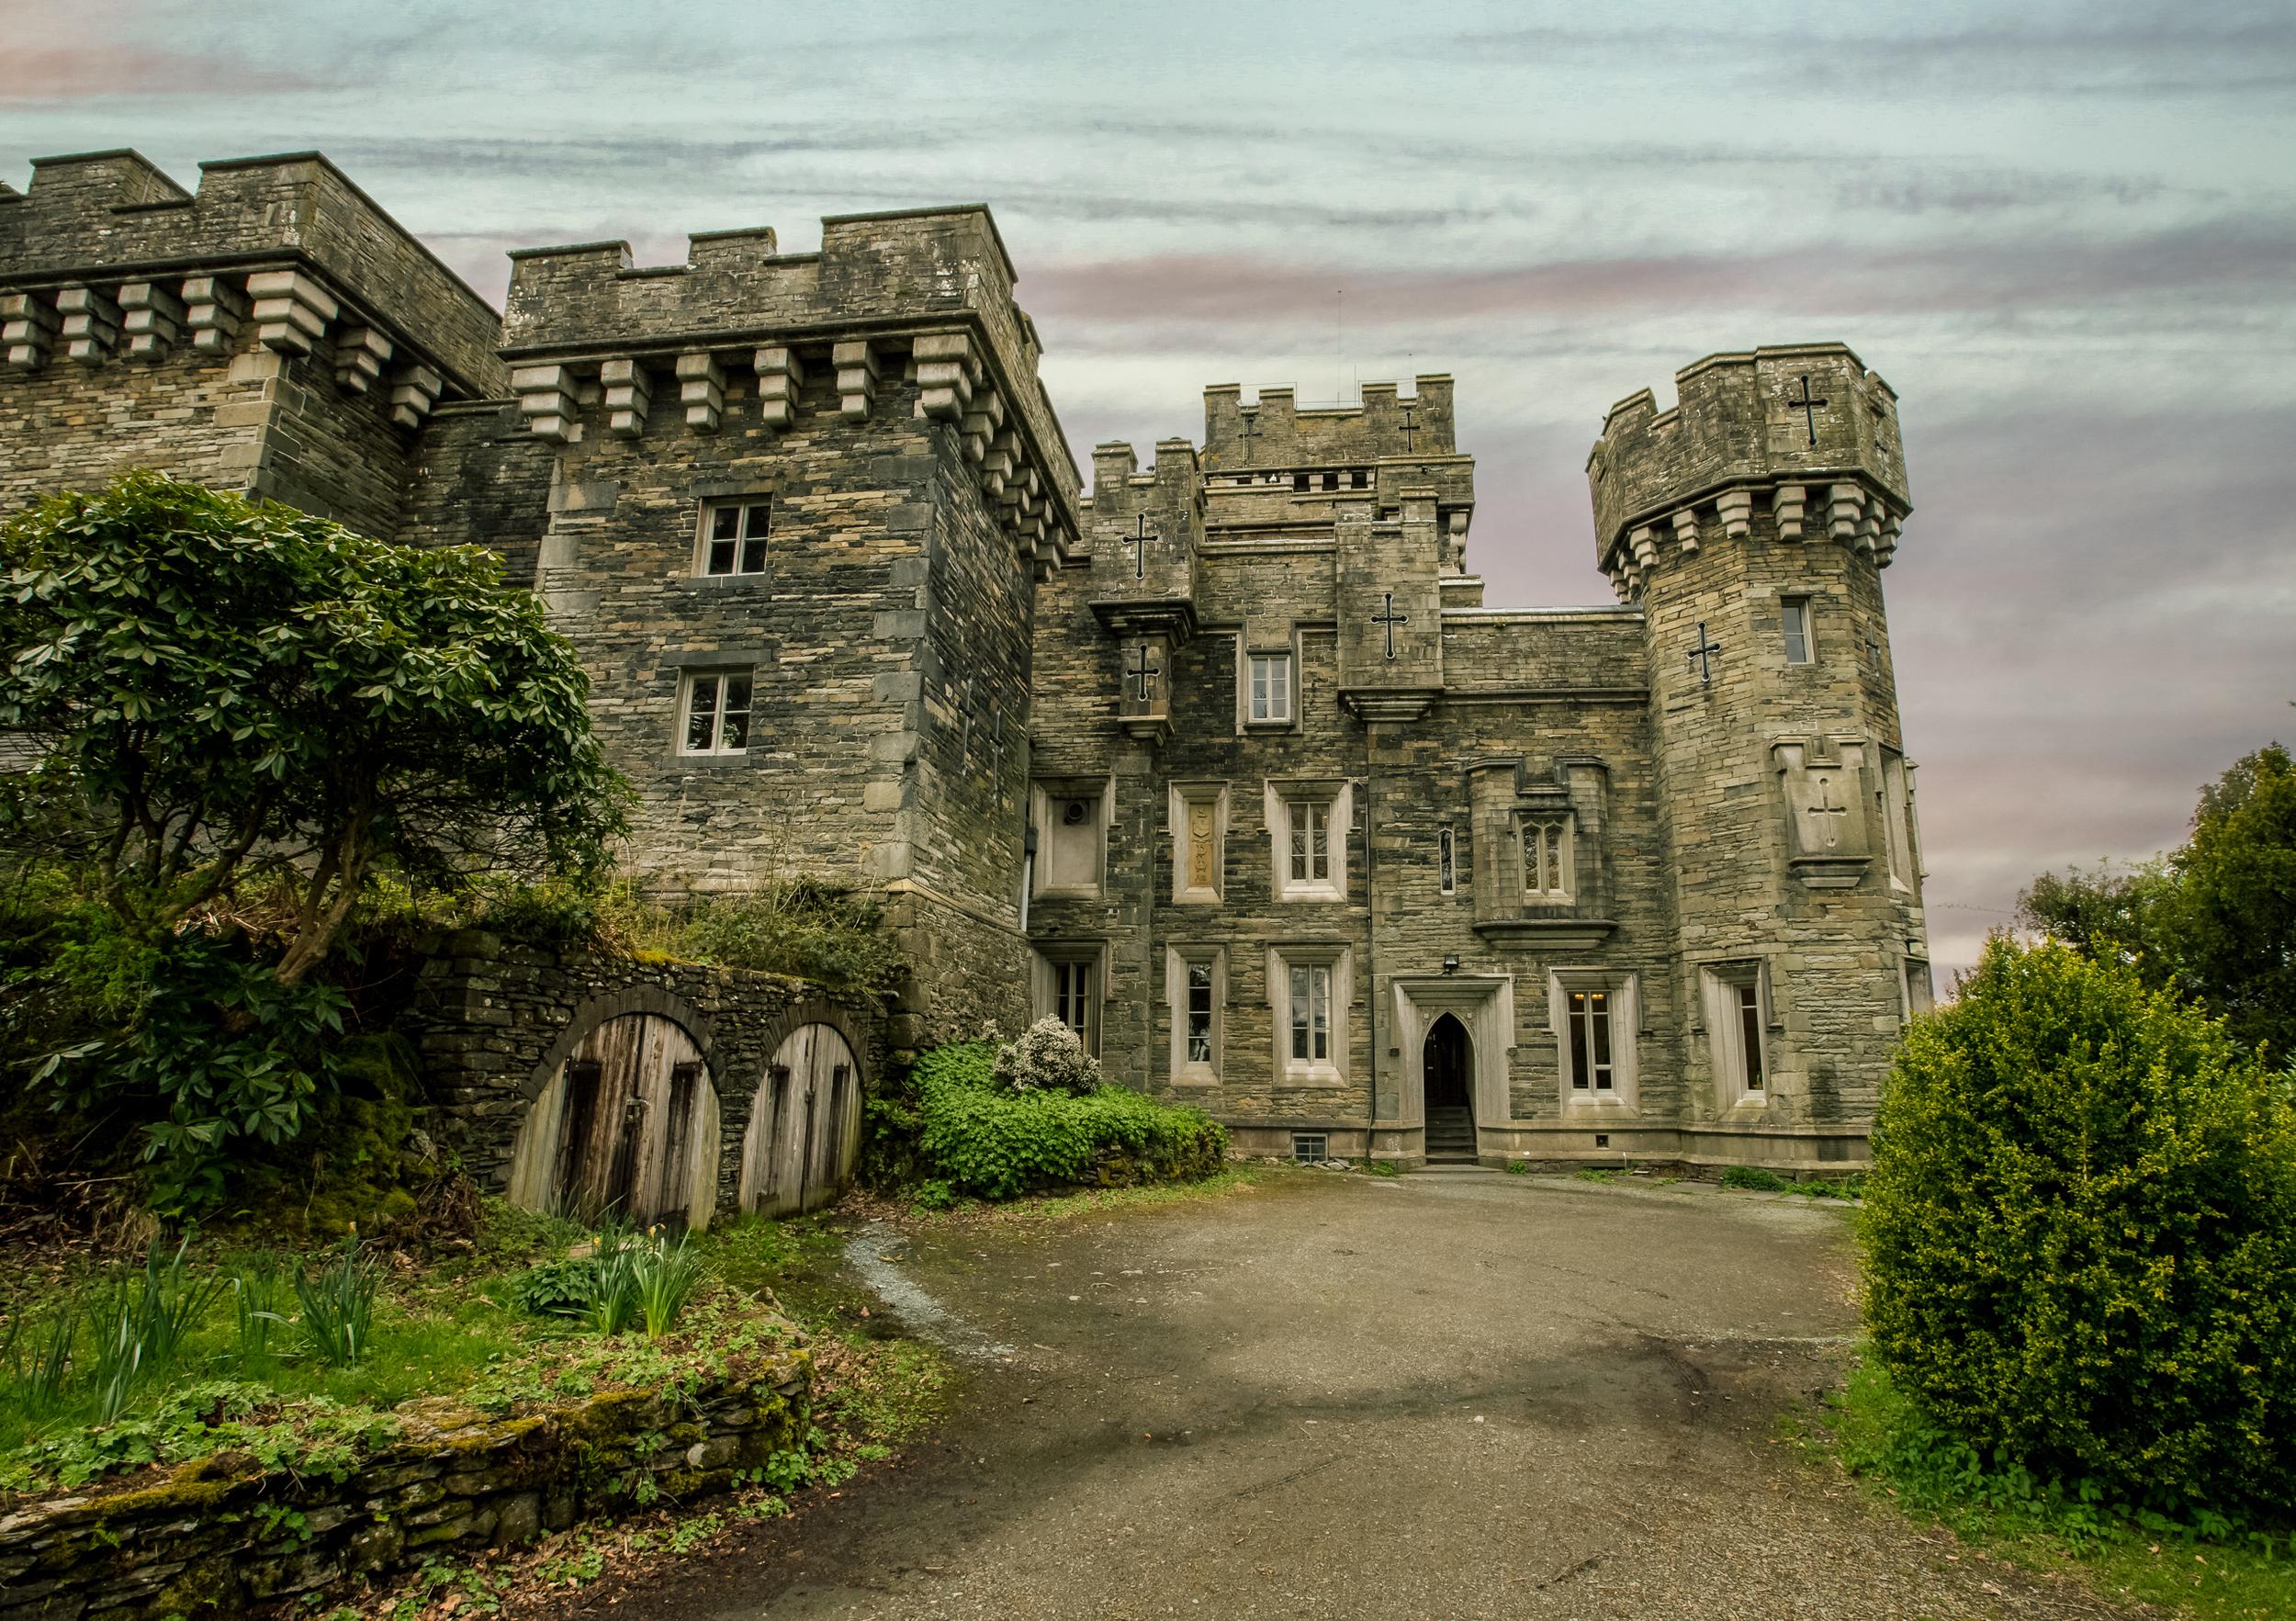 ©2015 jennifer bailey wray castle, rear view, windermere, cumbria